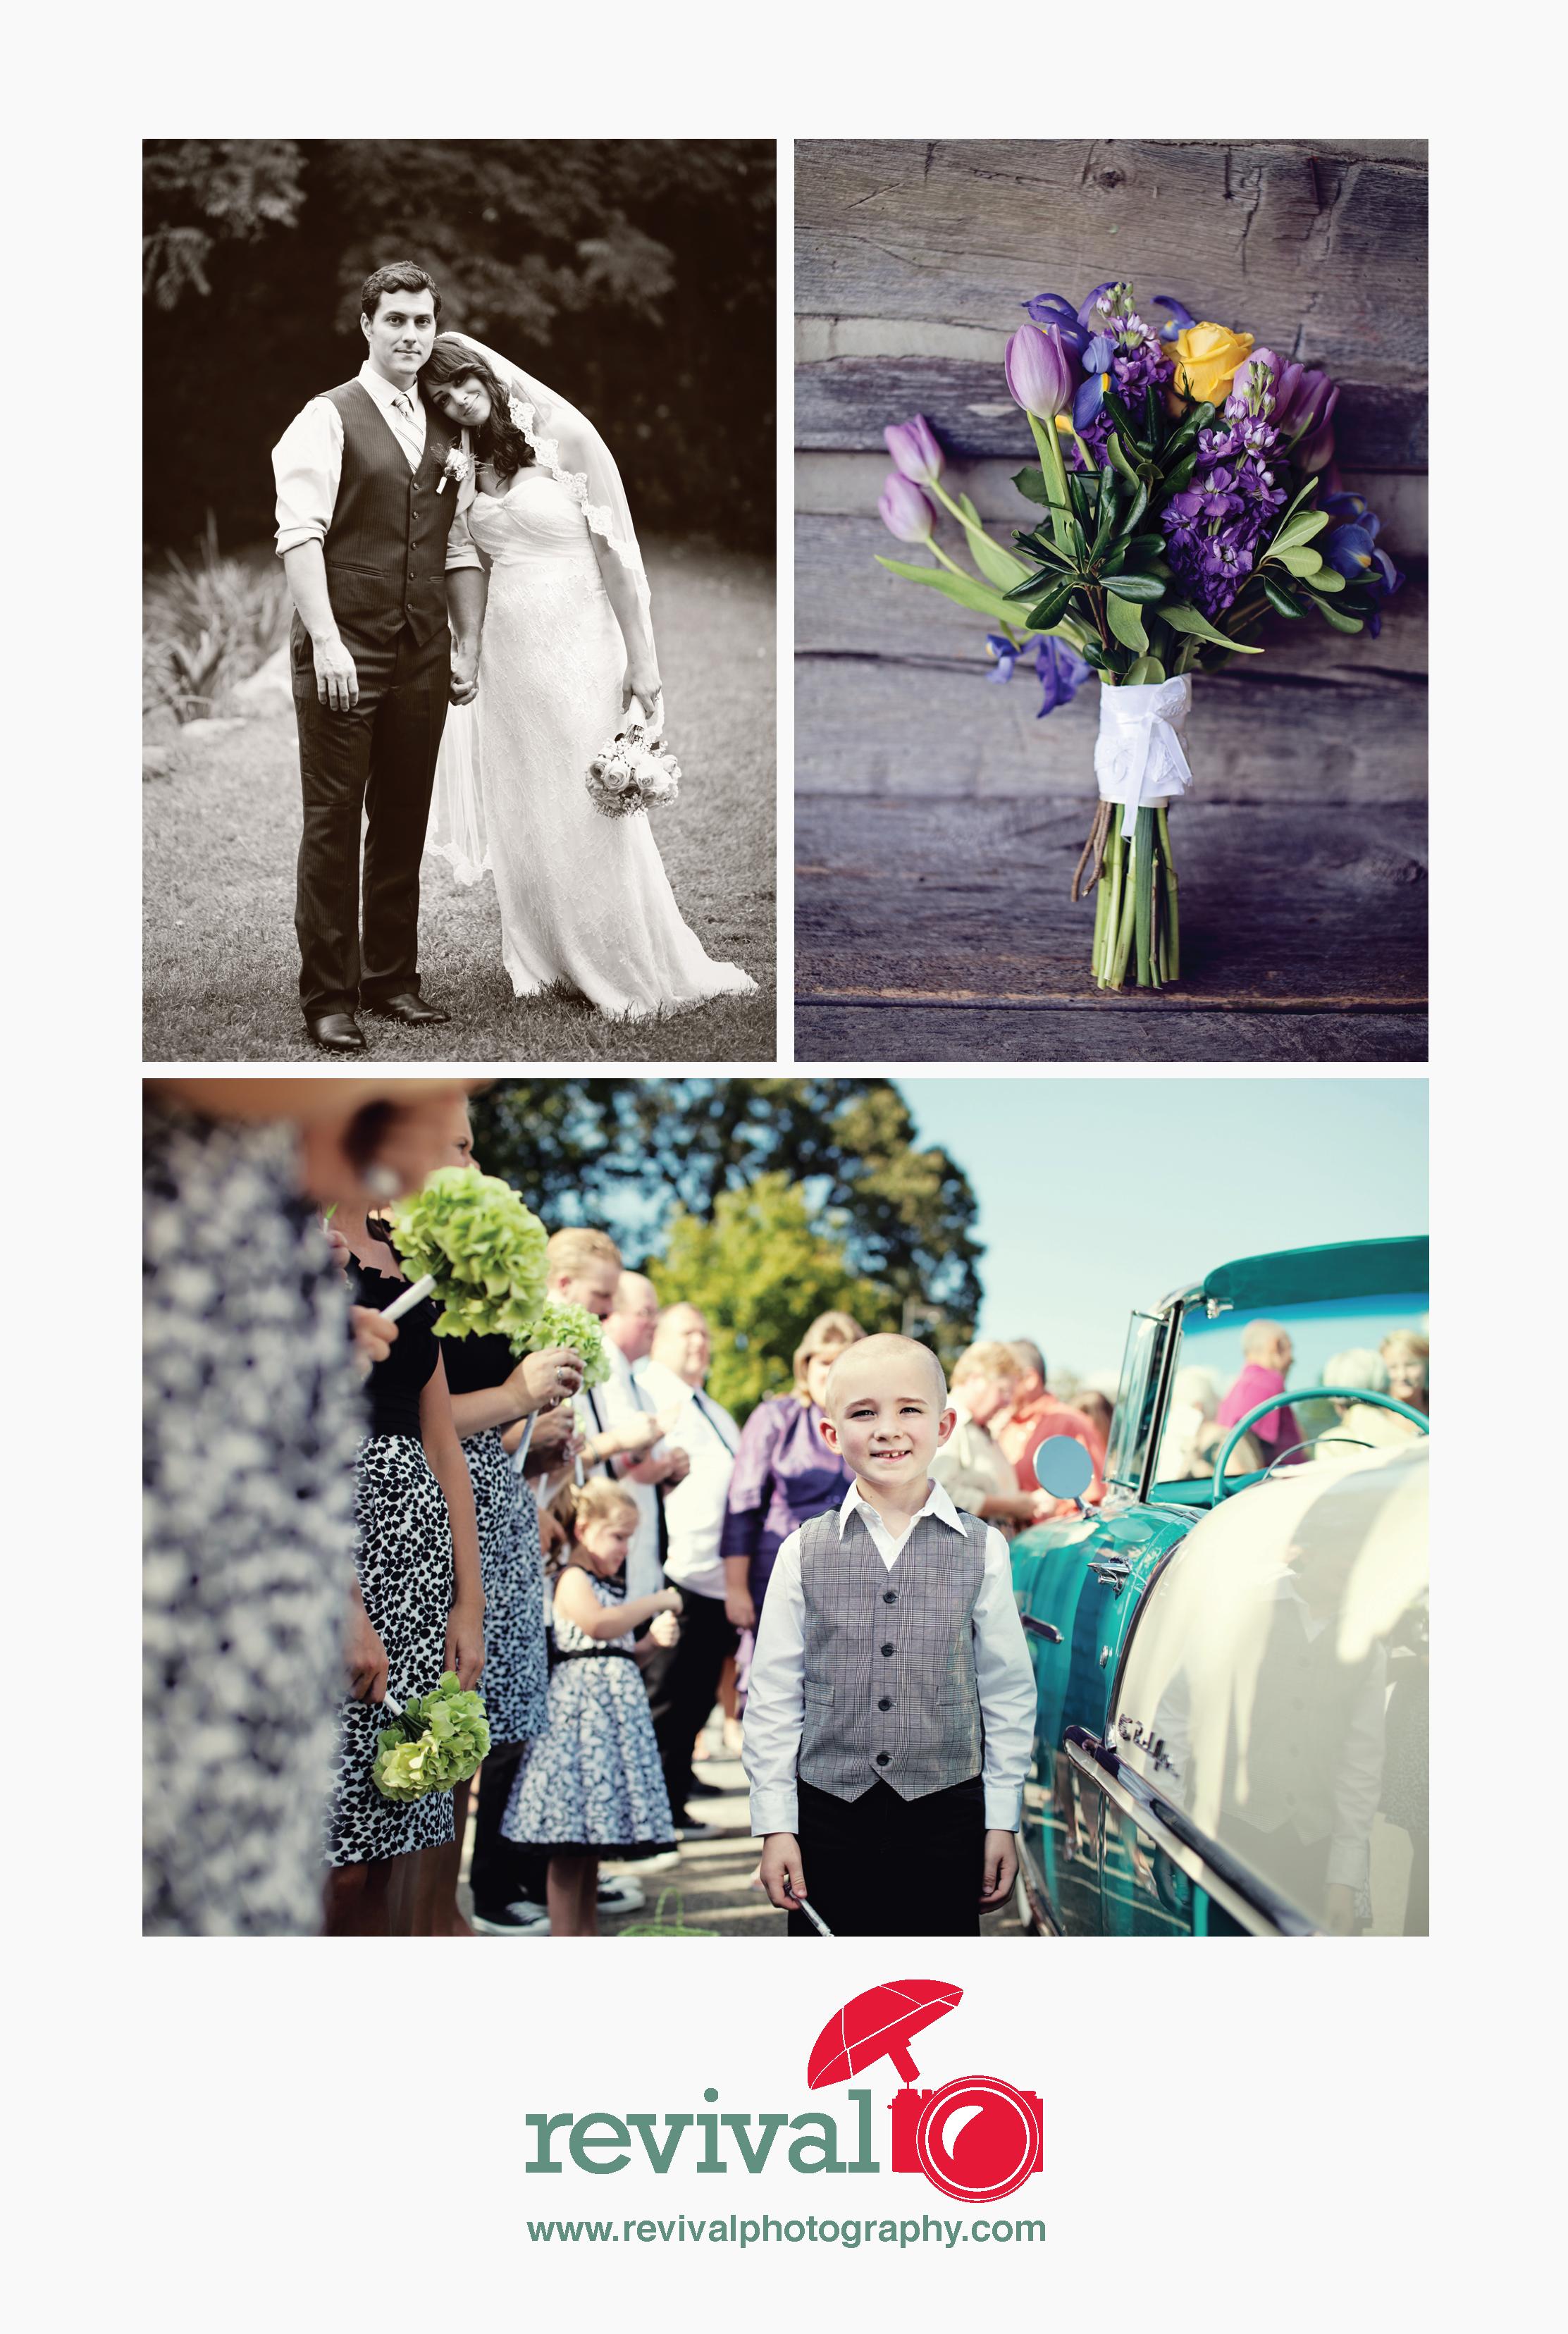 Revival Photography Jason and Heather Barr North Carolina Wedding Photographers